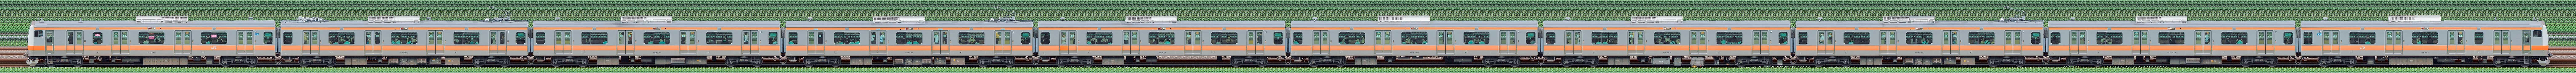 JR東日本 中央快速線 E233系T36編成(線路設備モニタリング装置搭載編成・山側)の編成サイドビュー